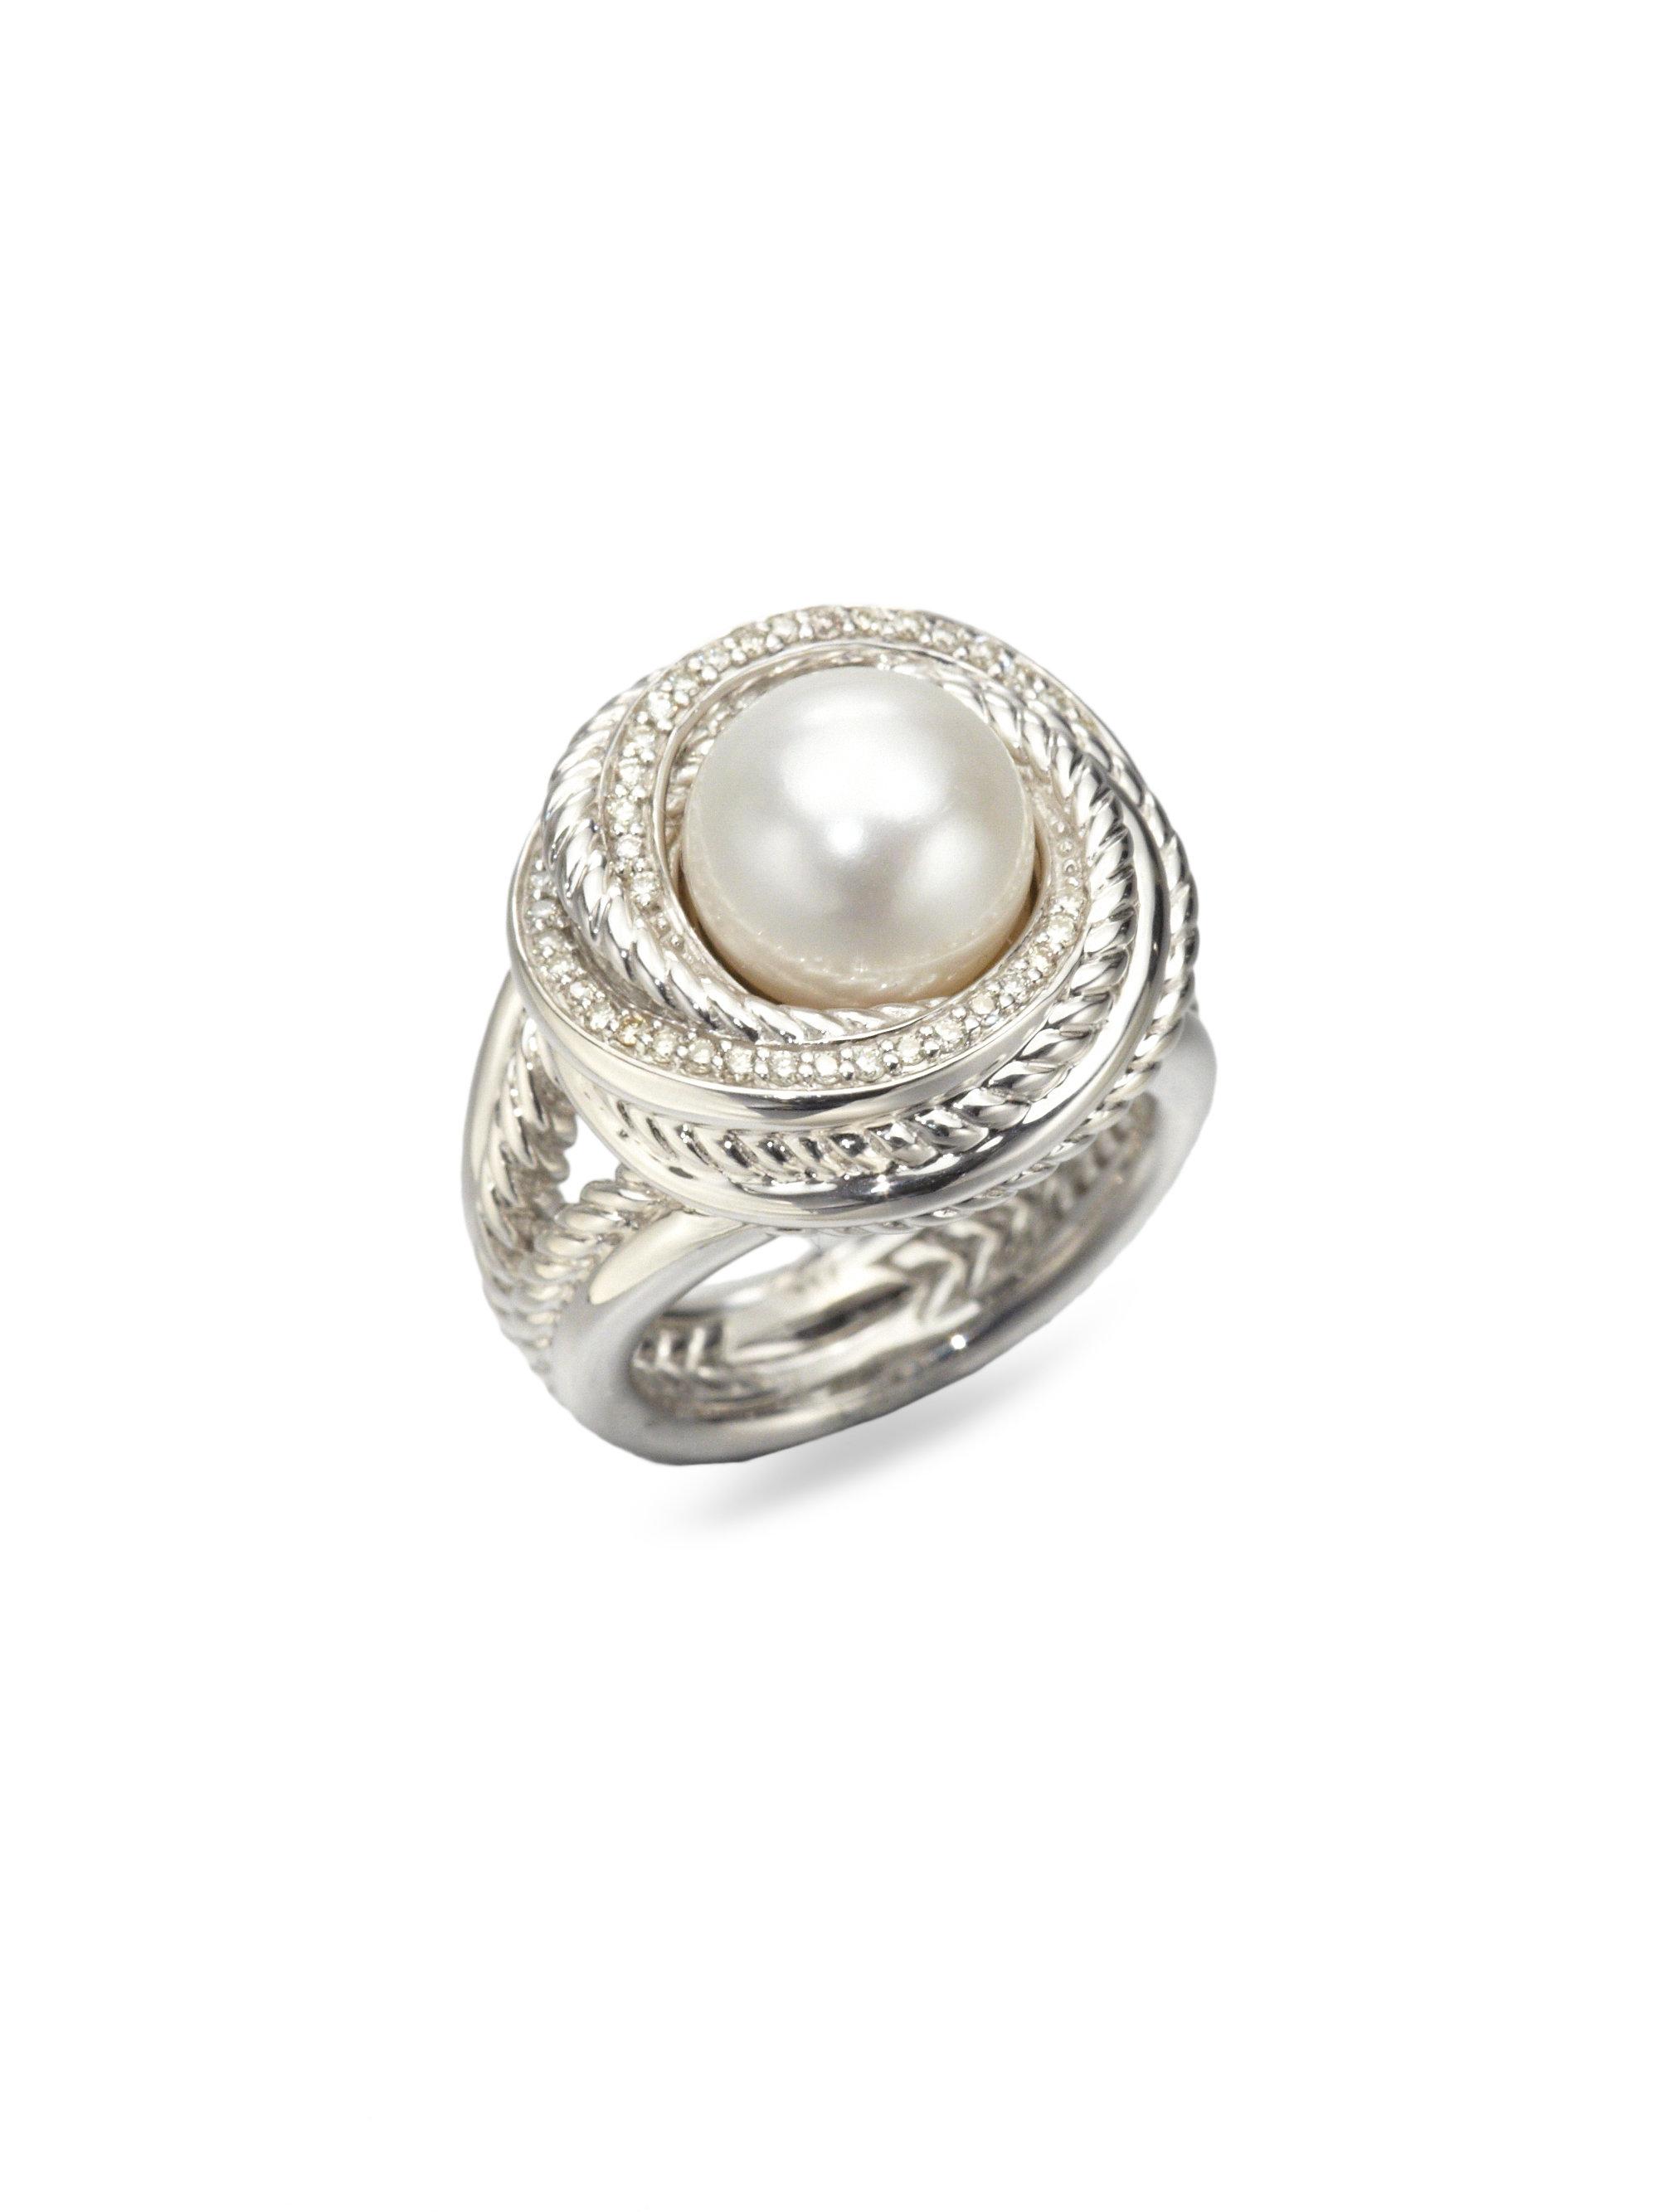 david yurman pearl sterling silver ring in silver